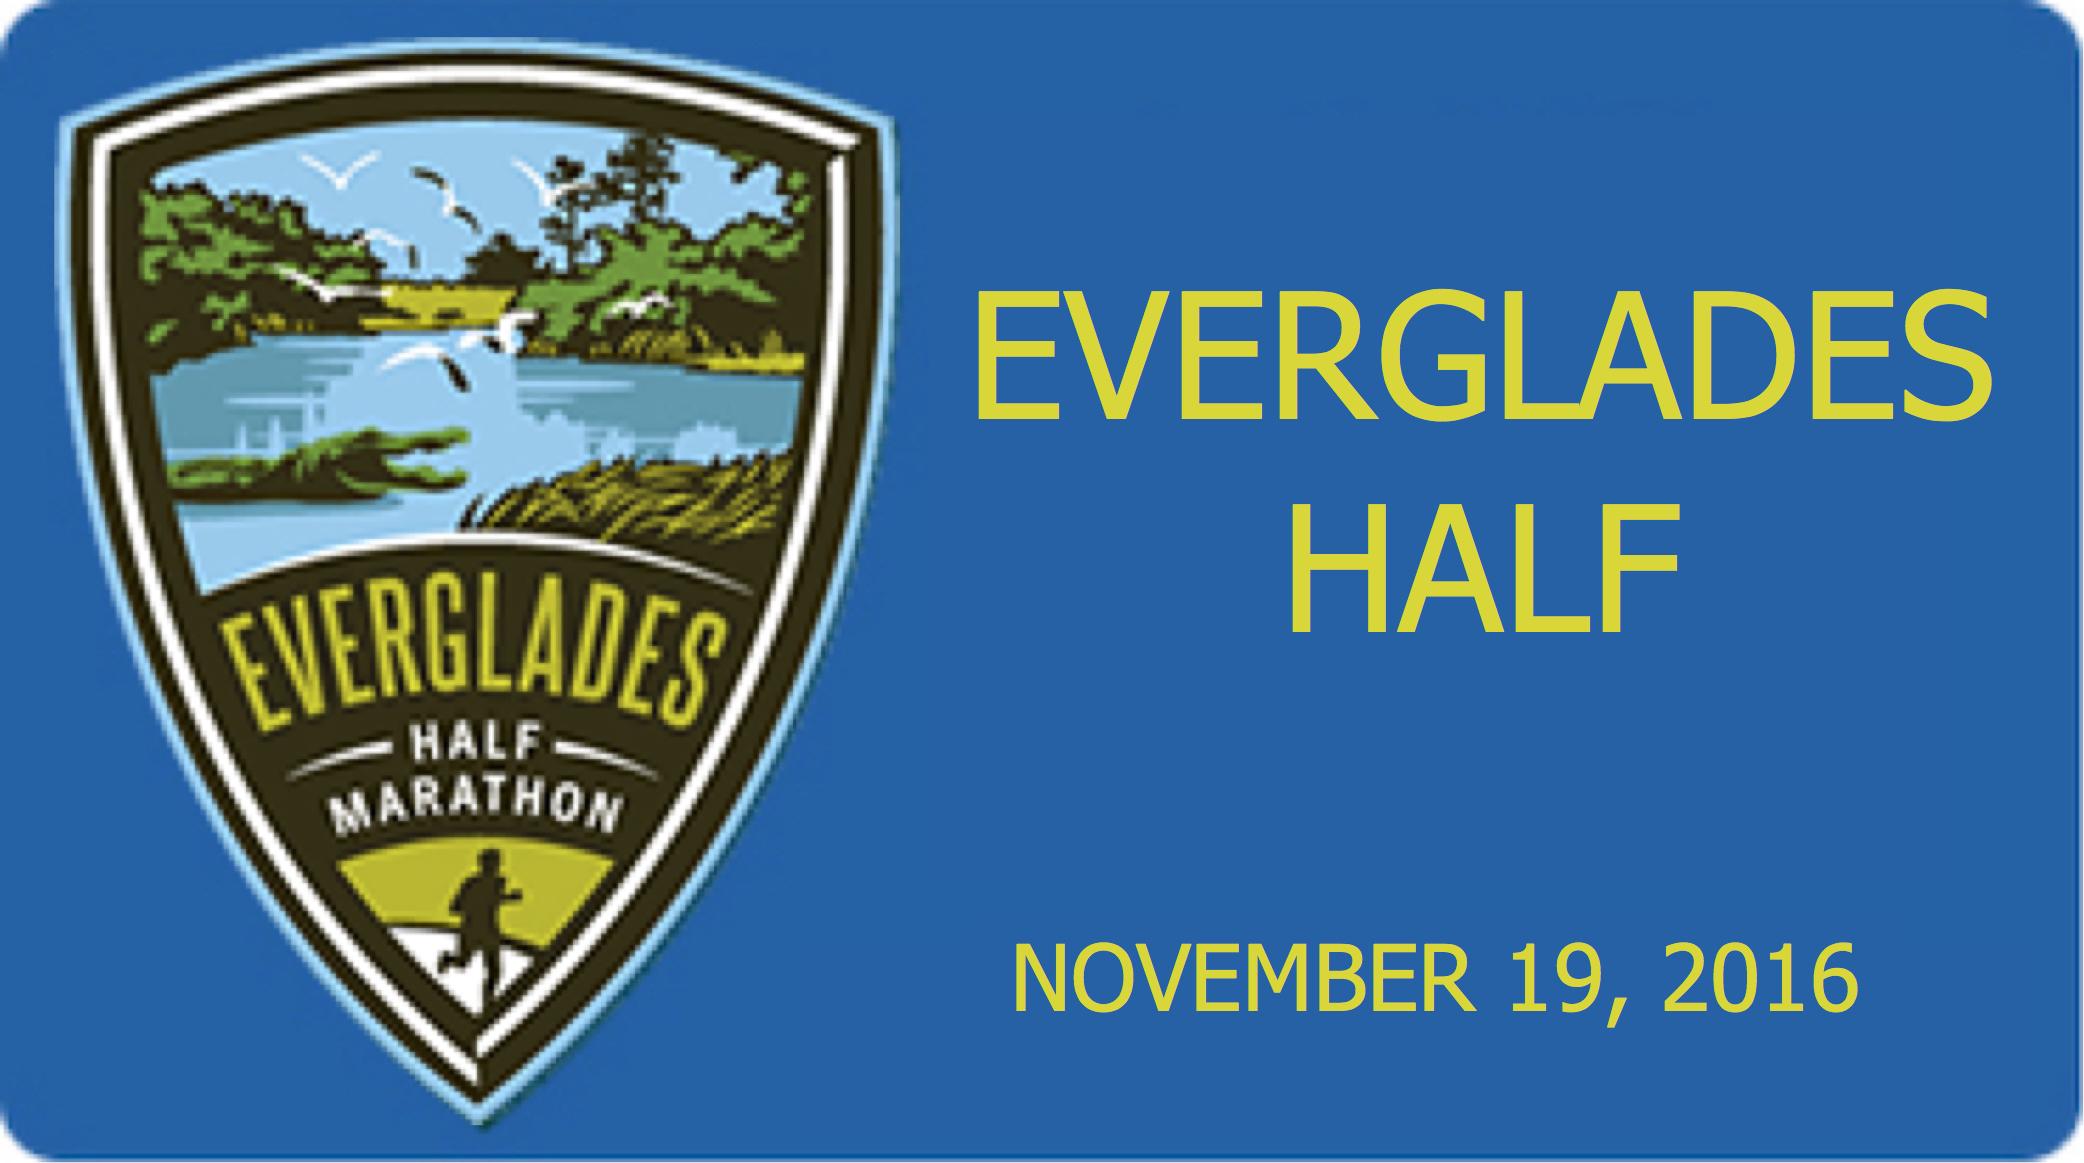 Everglades Half Marathon Active At Altitude